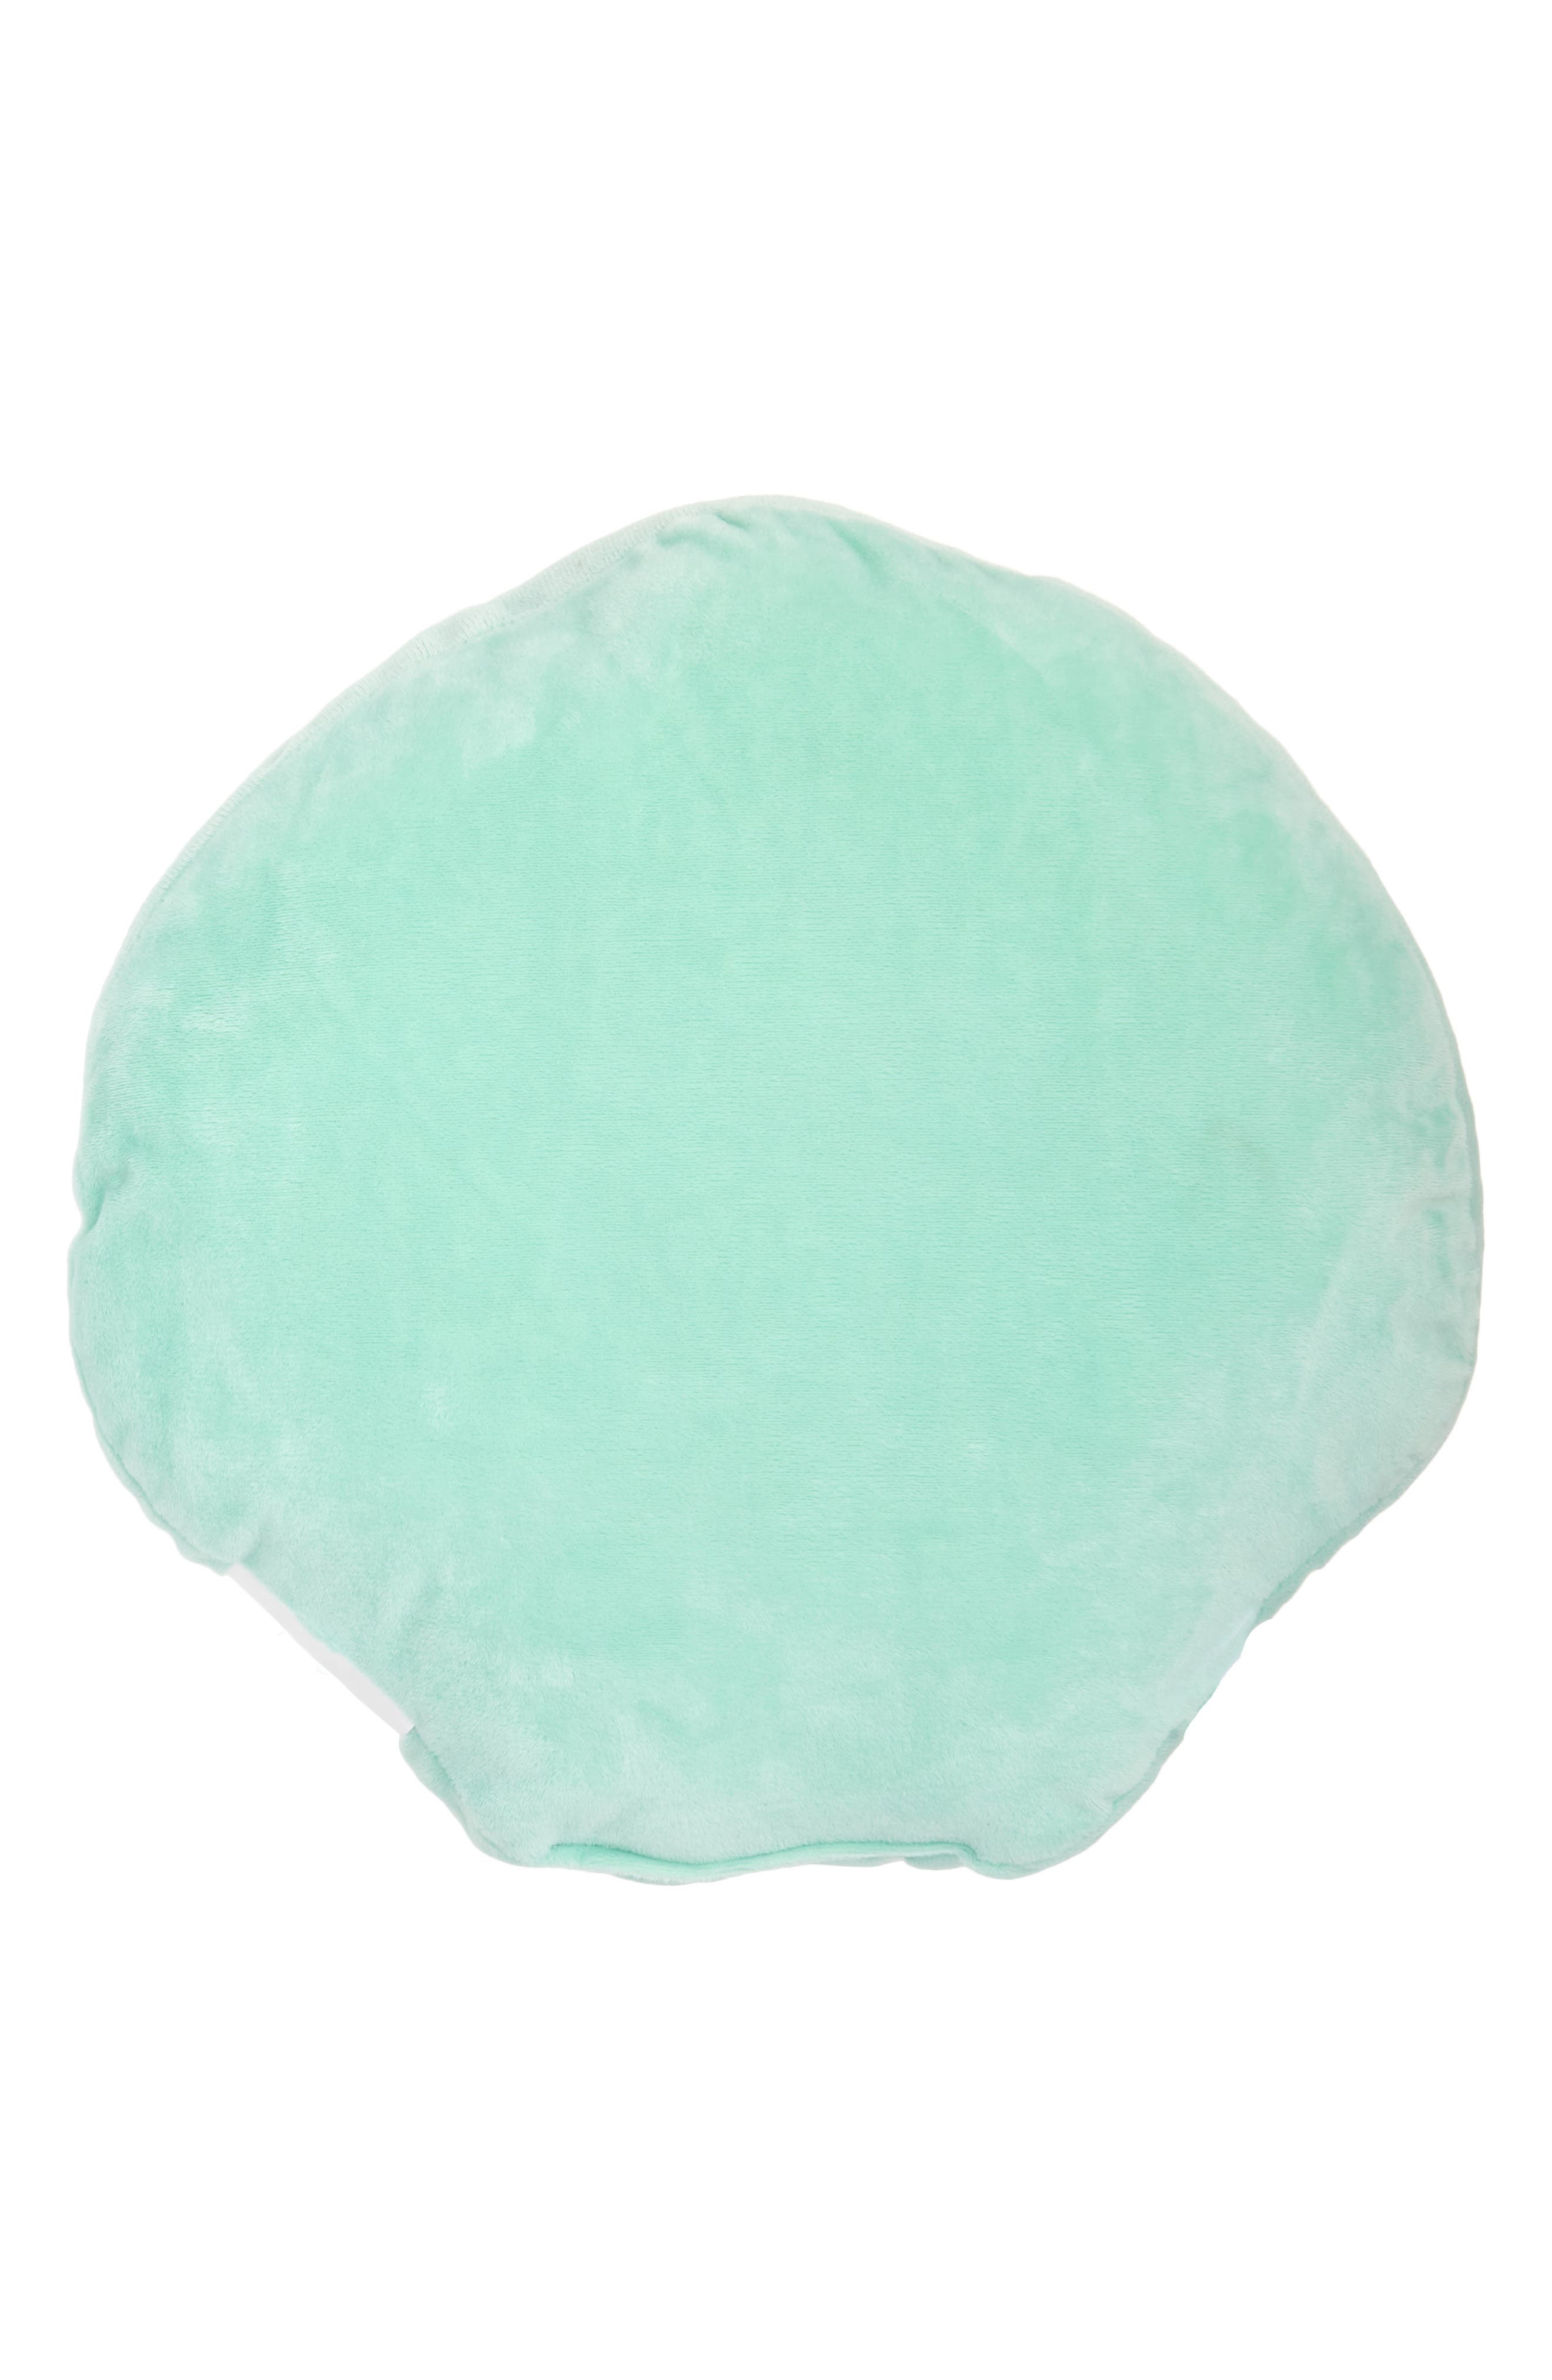 Reversible Sequin Seashell Pillow,                             Alternate thumbnail 2, color,